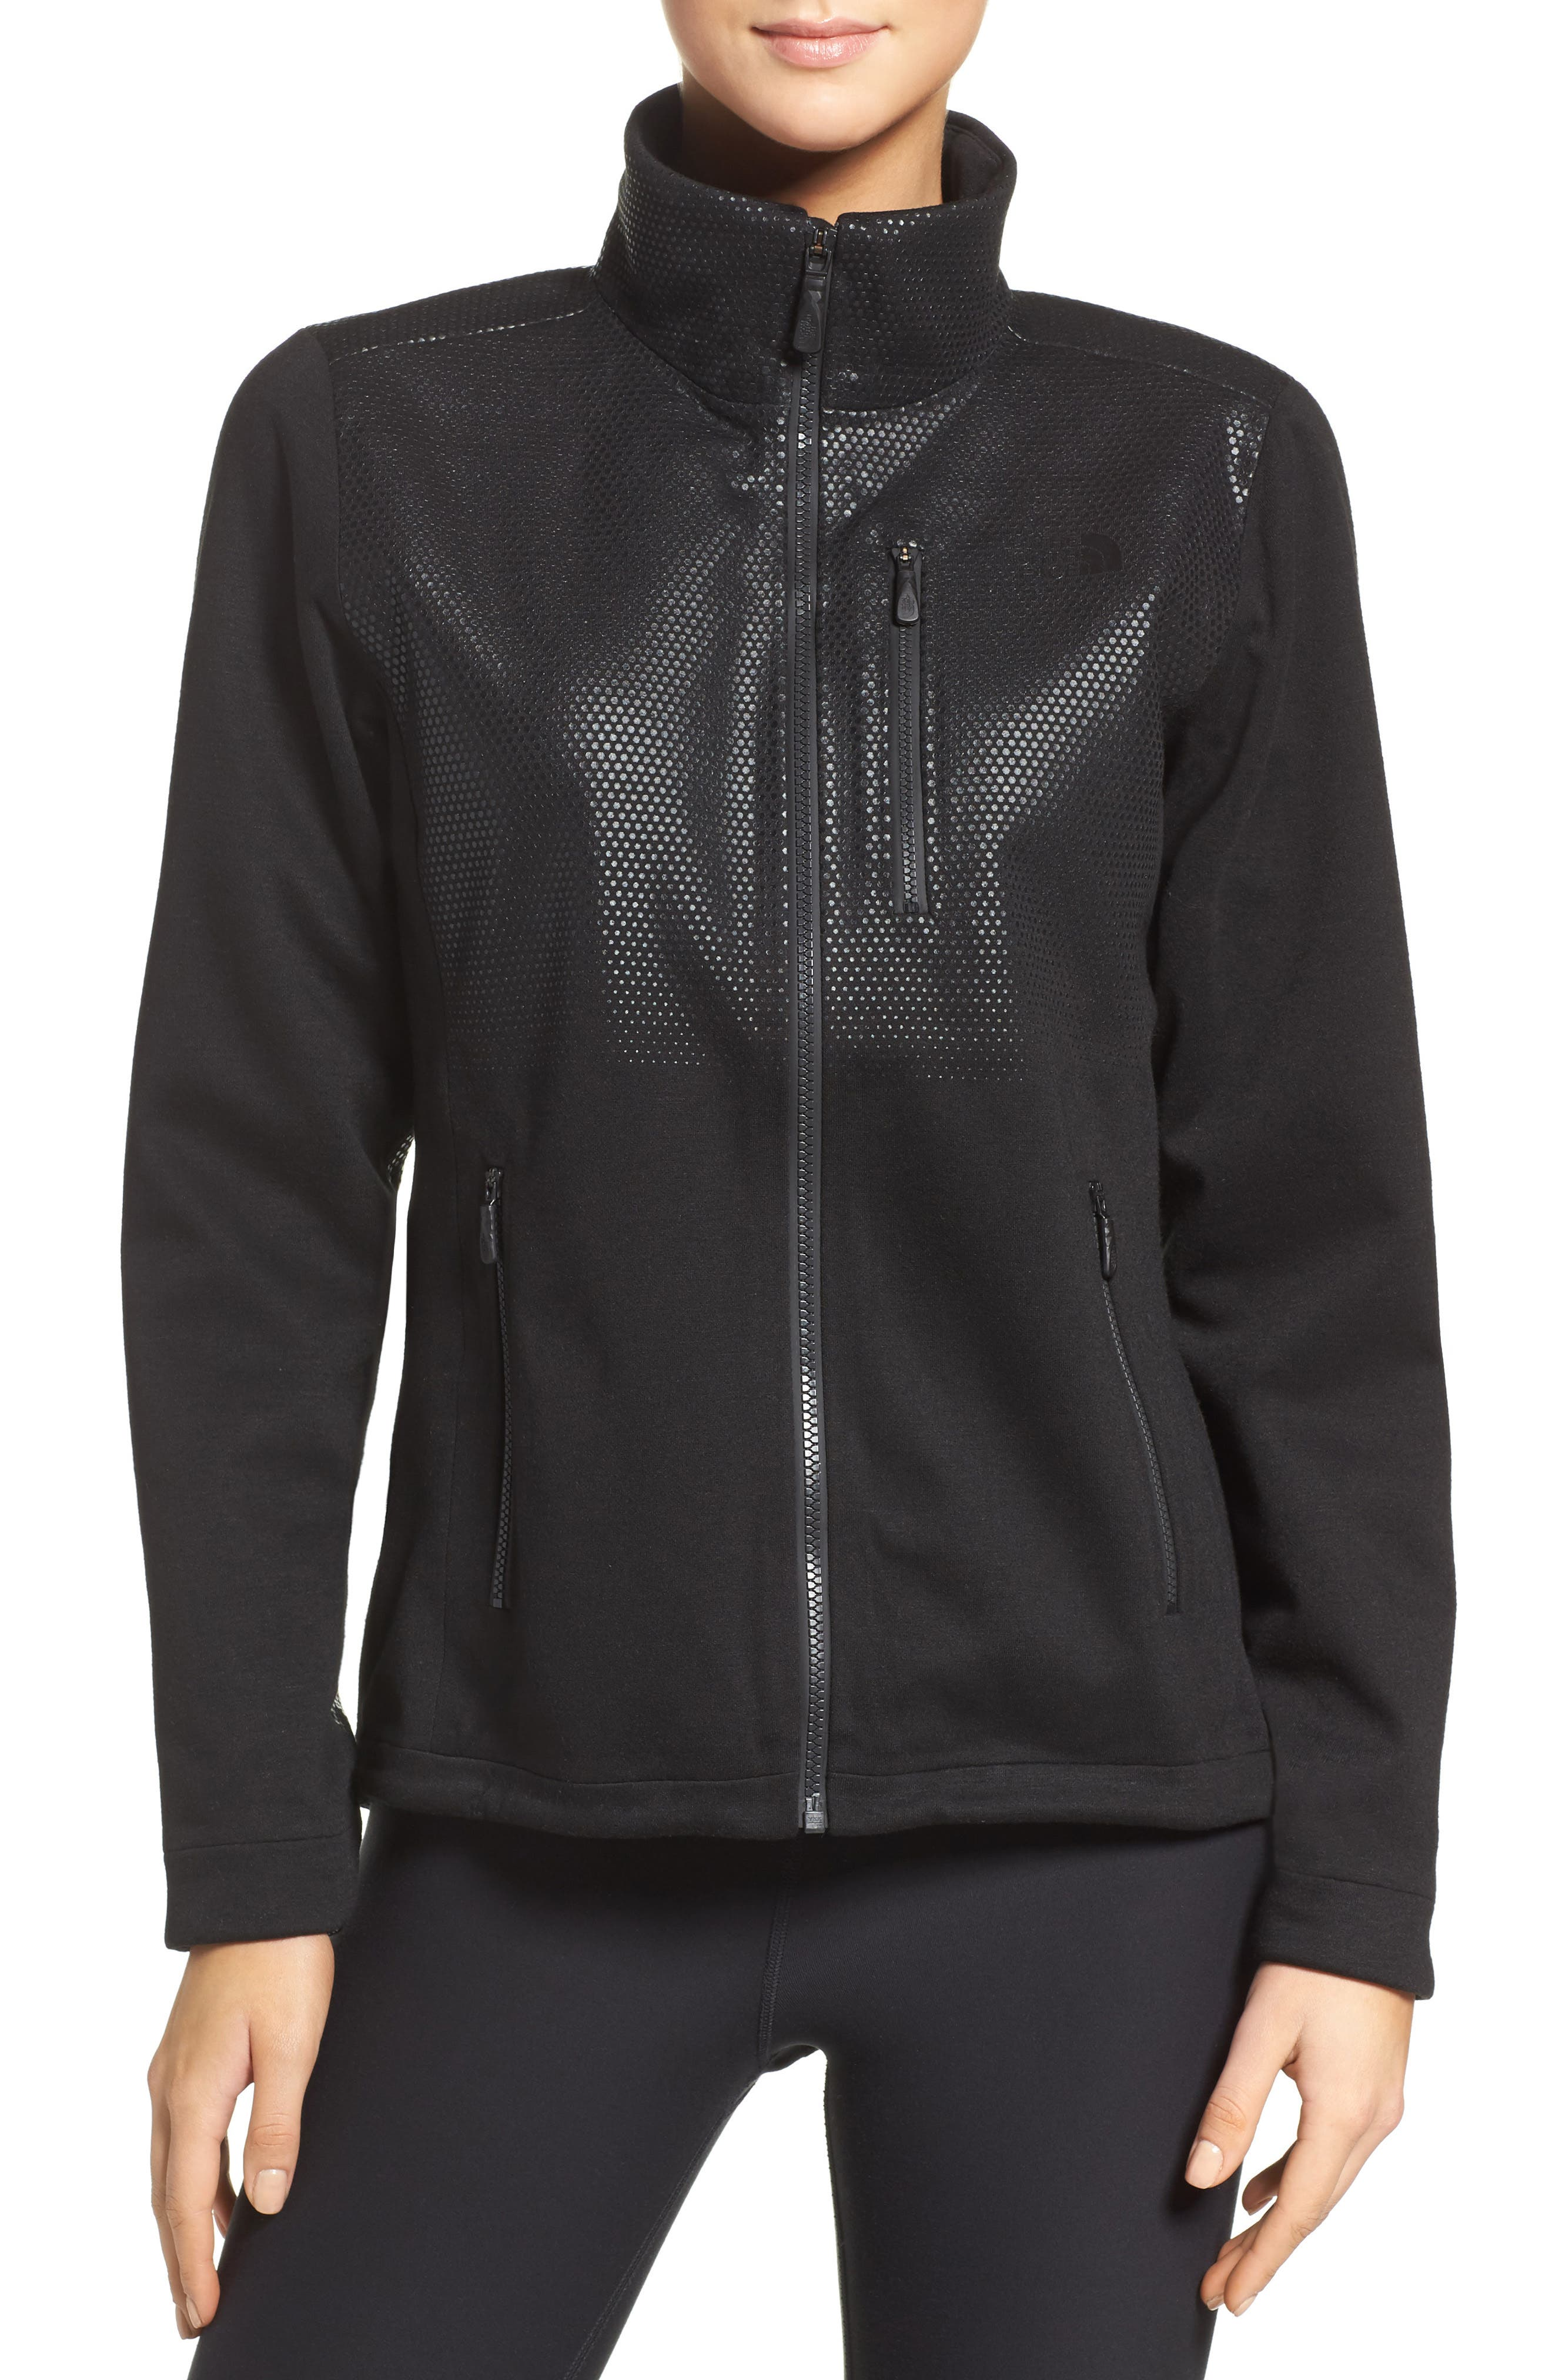 Main Image - The North Face Denali Revolution Jacket